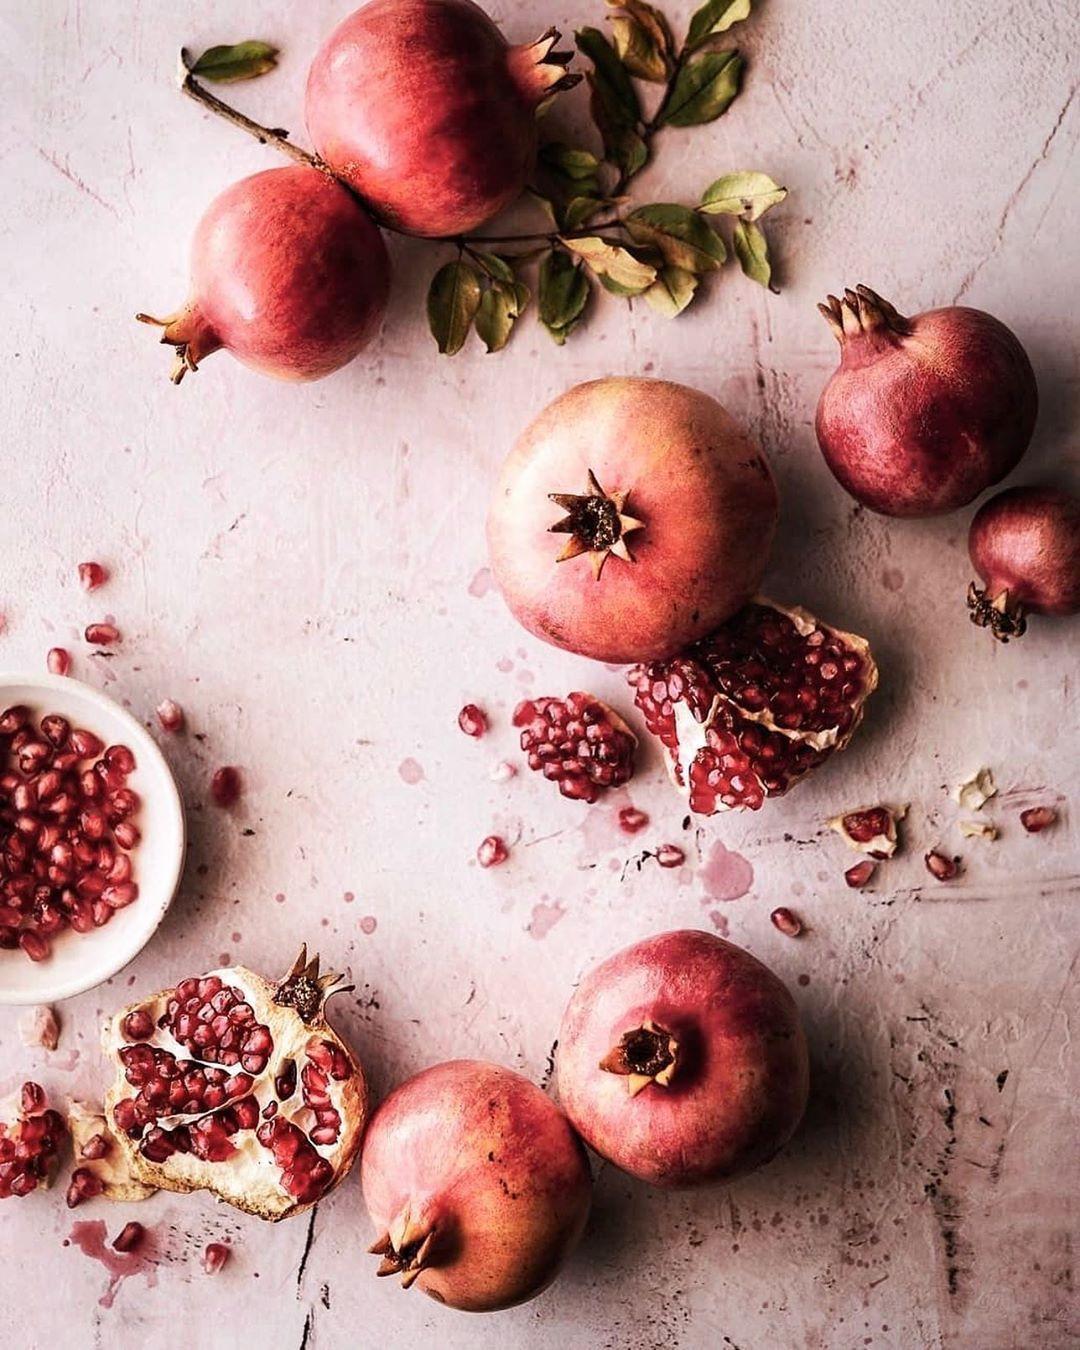 Bella Ful Filled Ful Filled Posted On Instagram Nov 19 2019 At 3 01pm Utc In 2020 Fruit Food Pomegranate